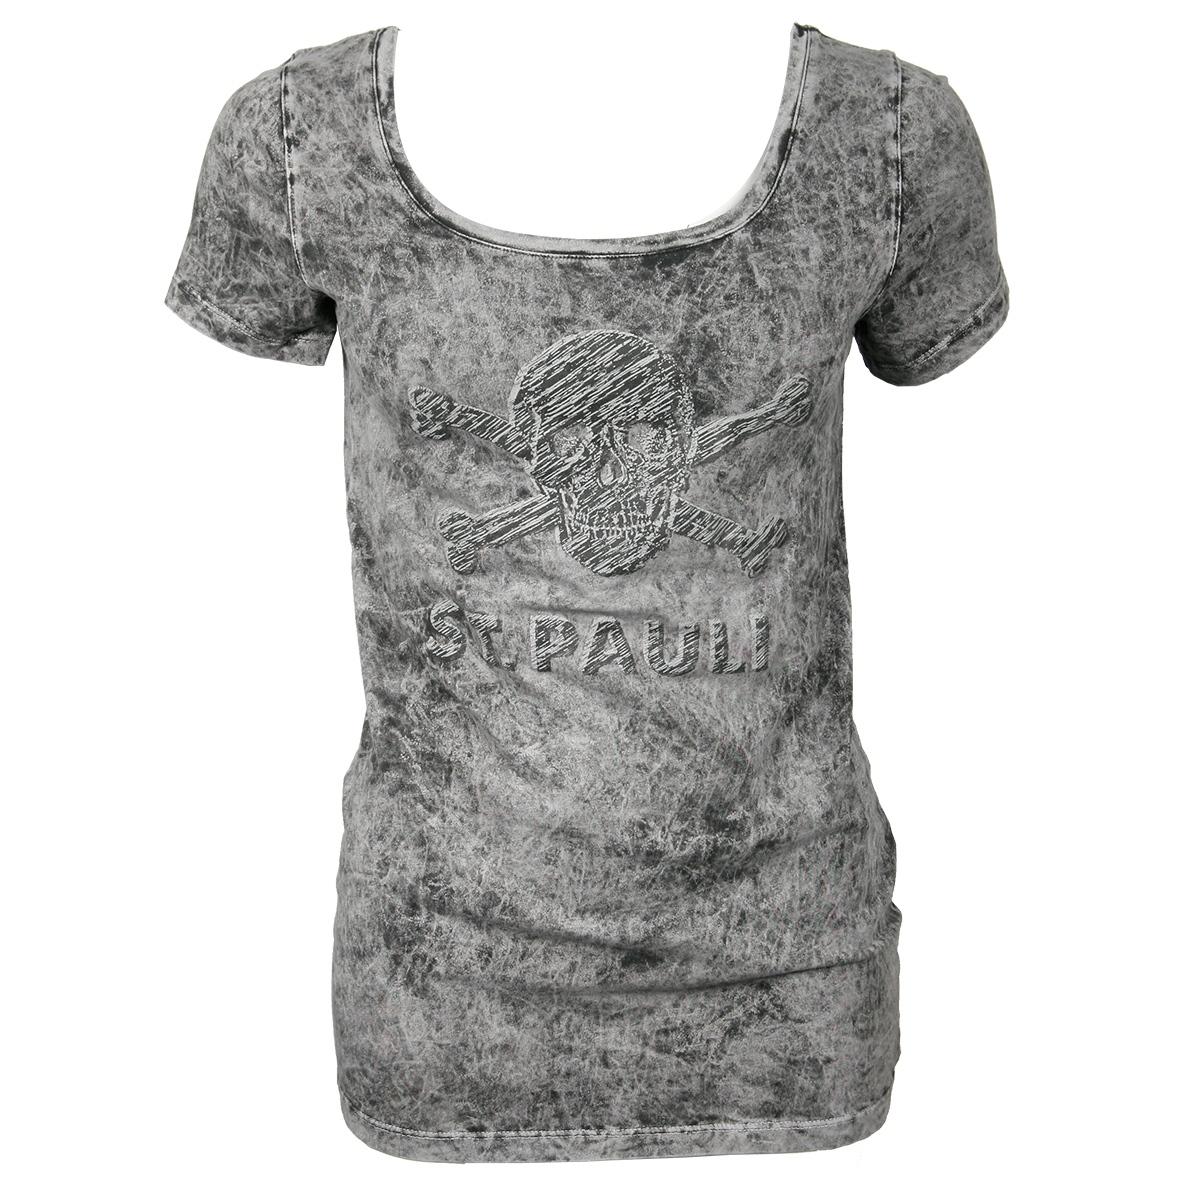 FC St. Pauli - Damen T-Shirt Totenkopf Scratch - grau